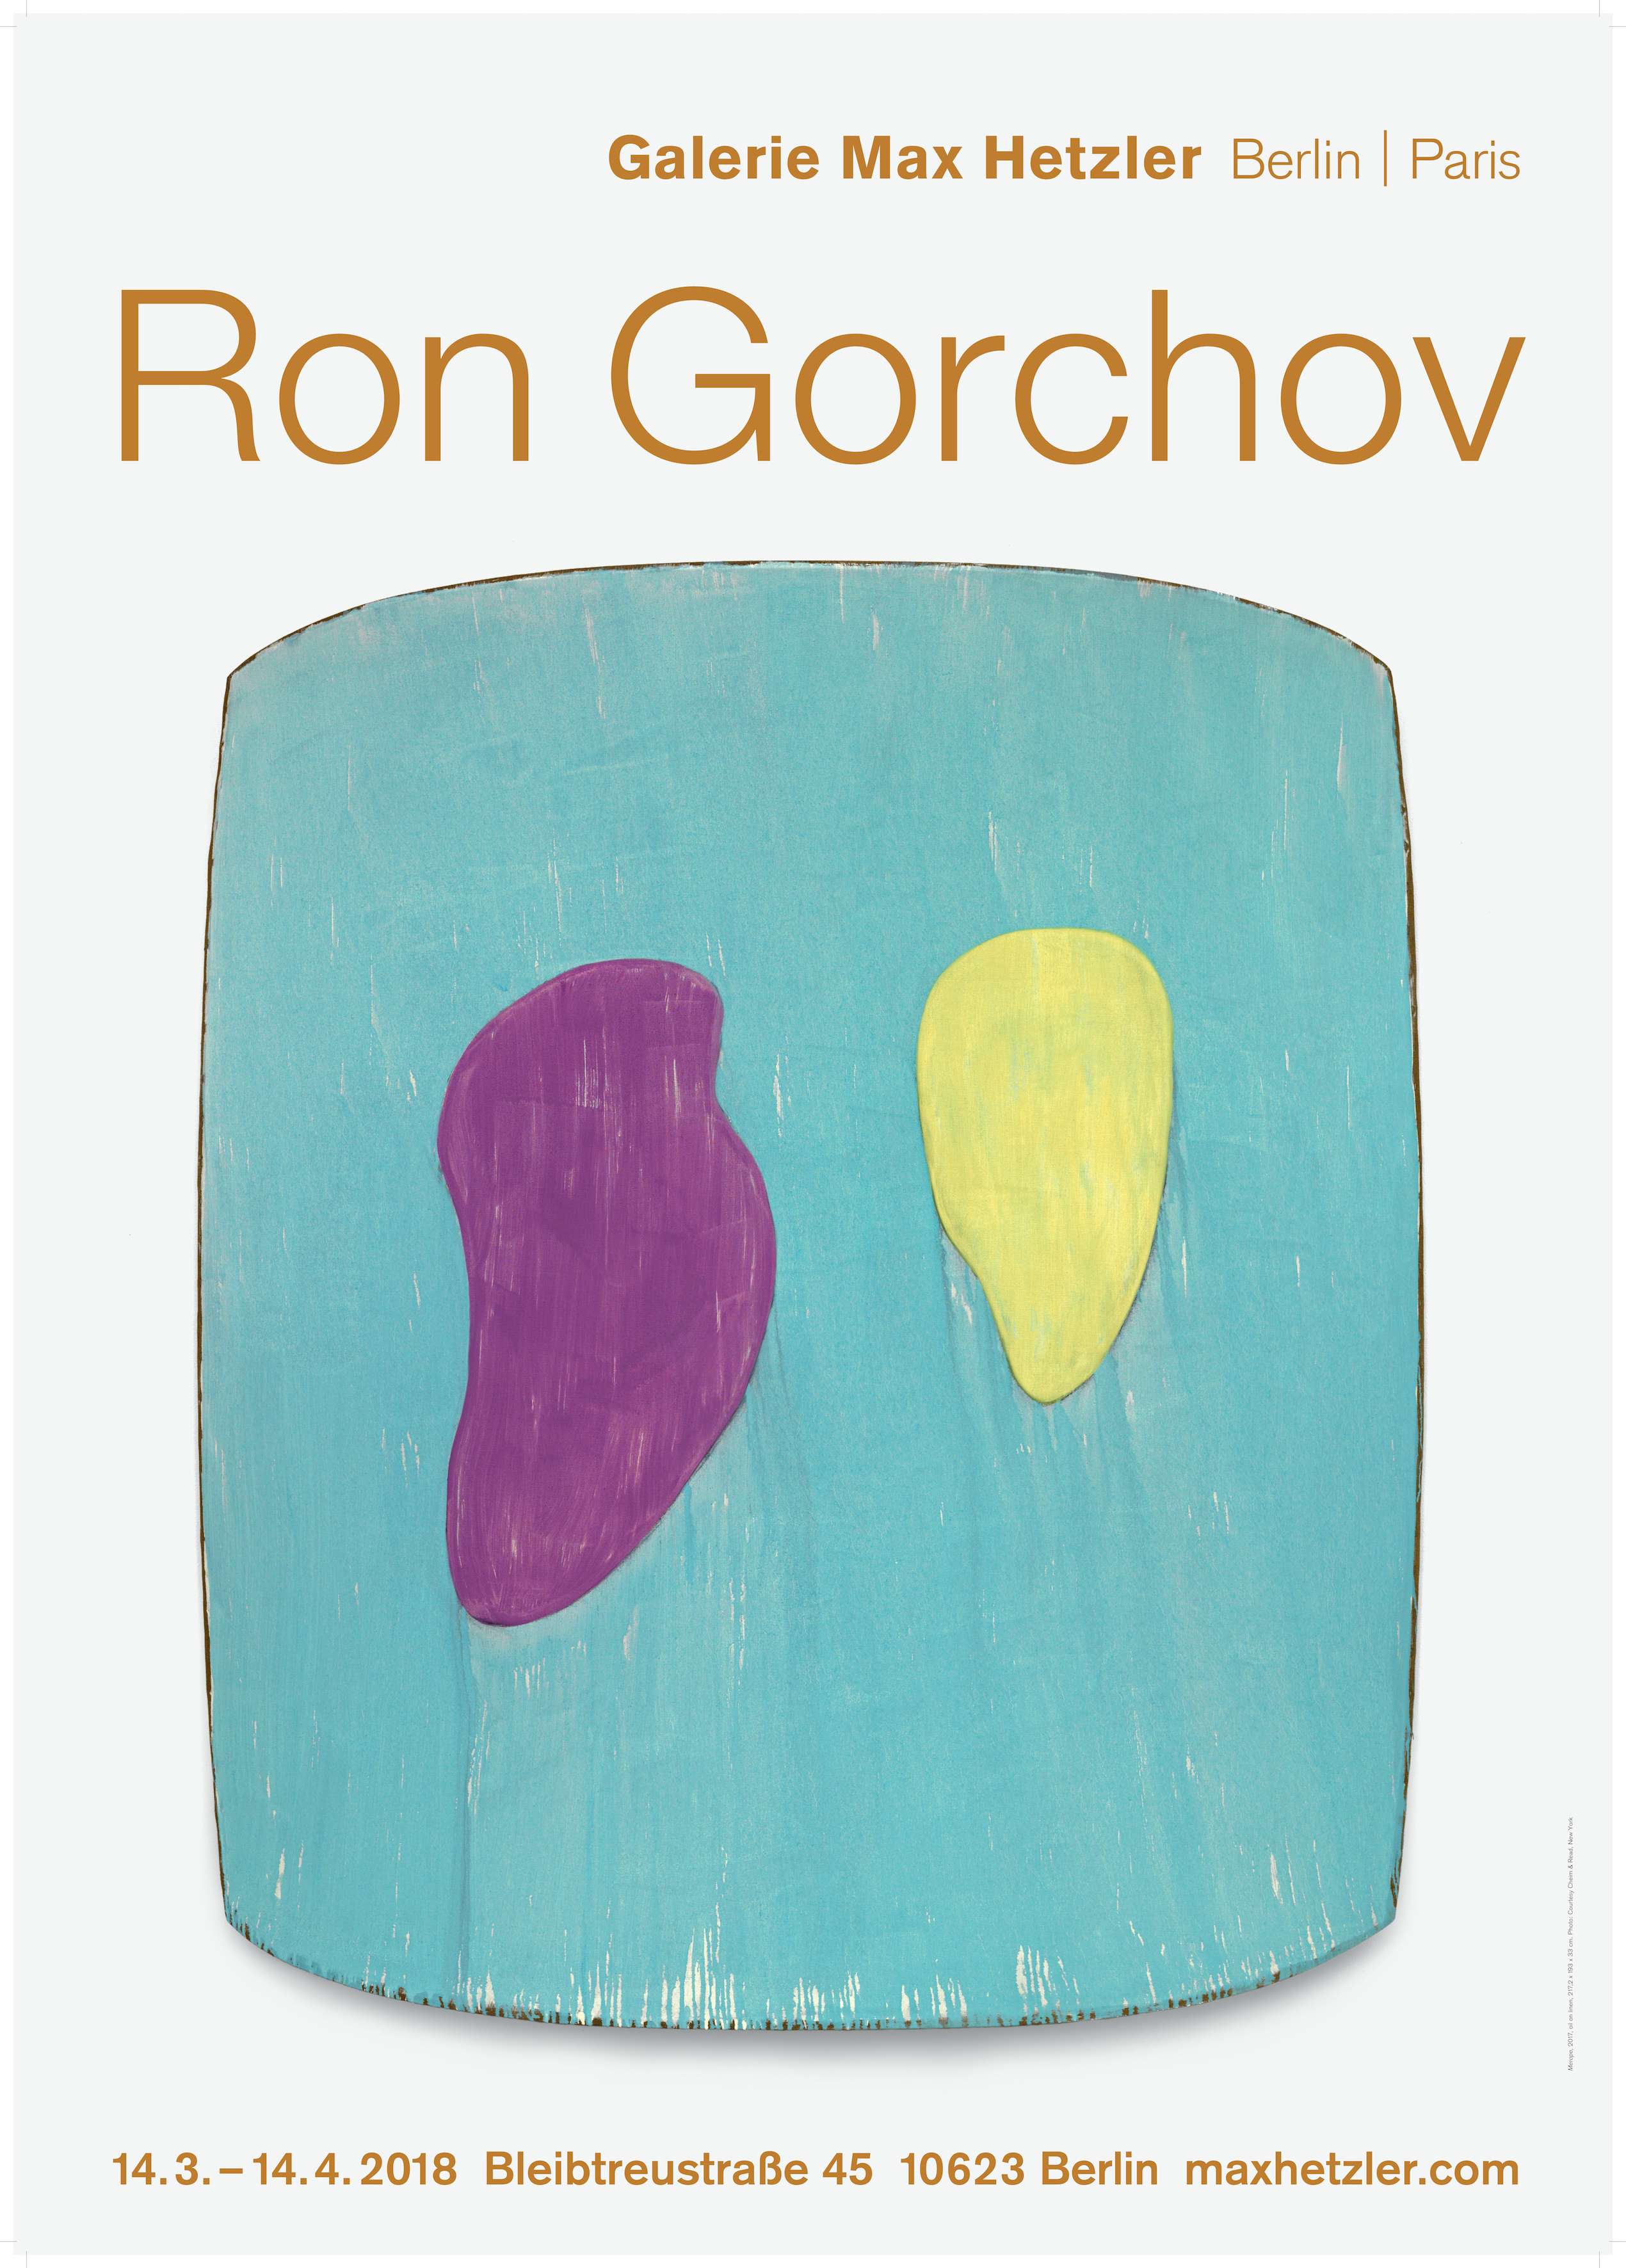 Ron Gorchov - Galerie Max Hetzler